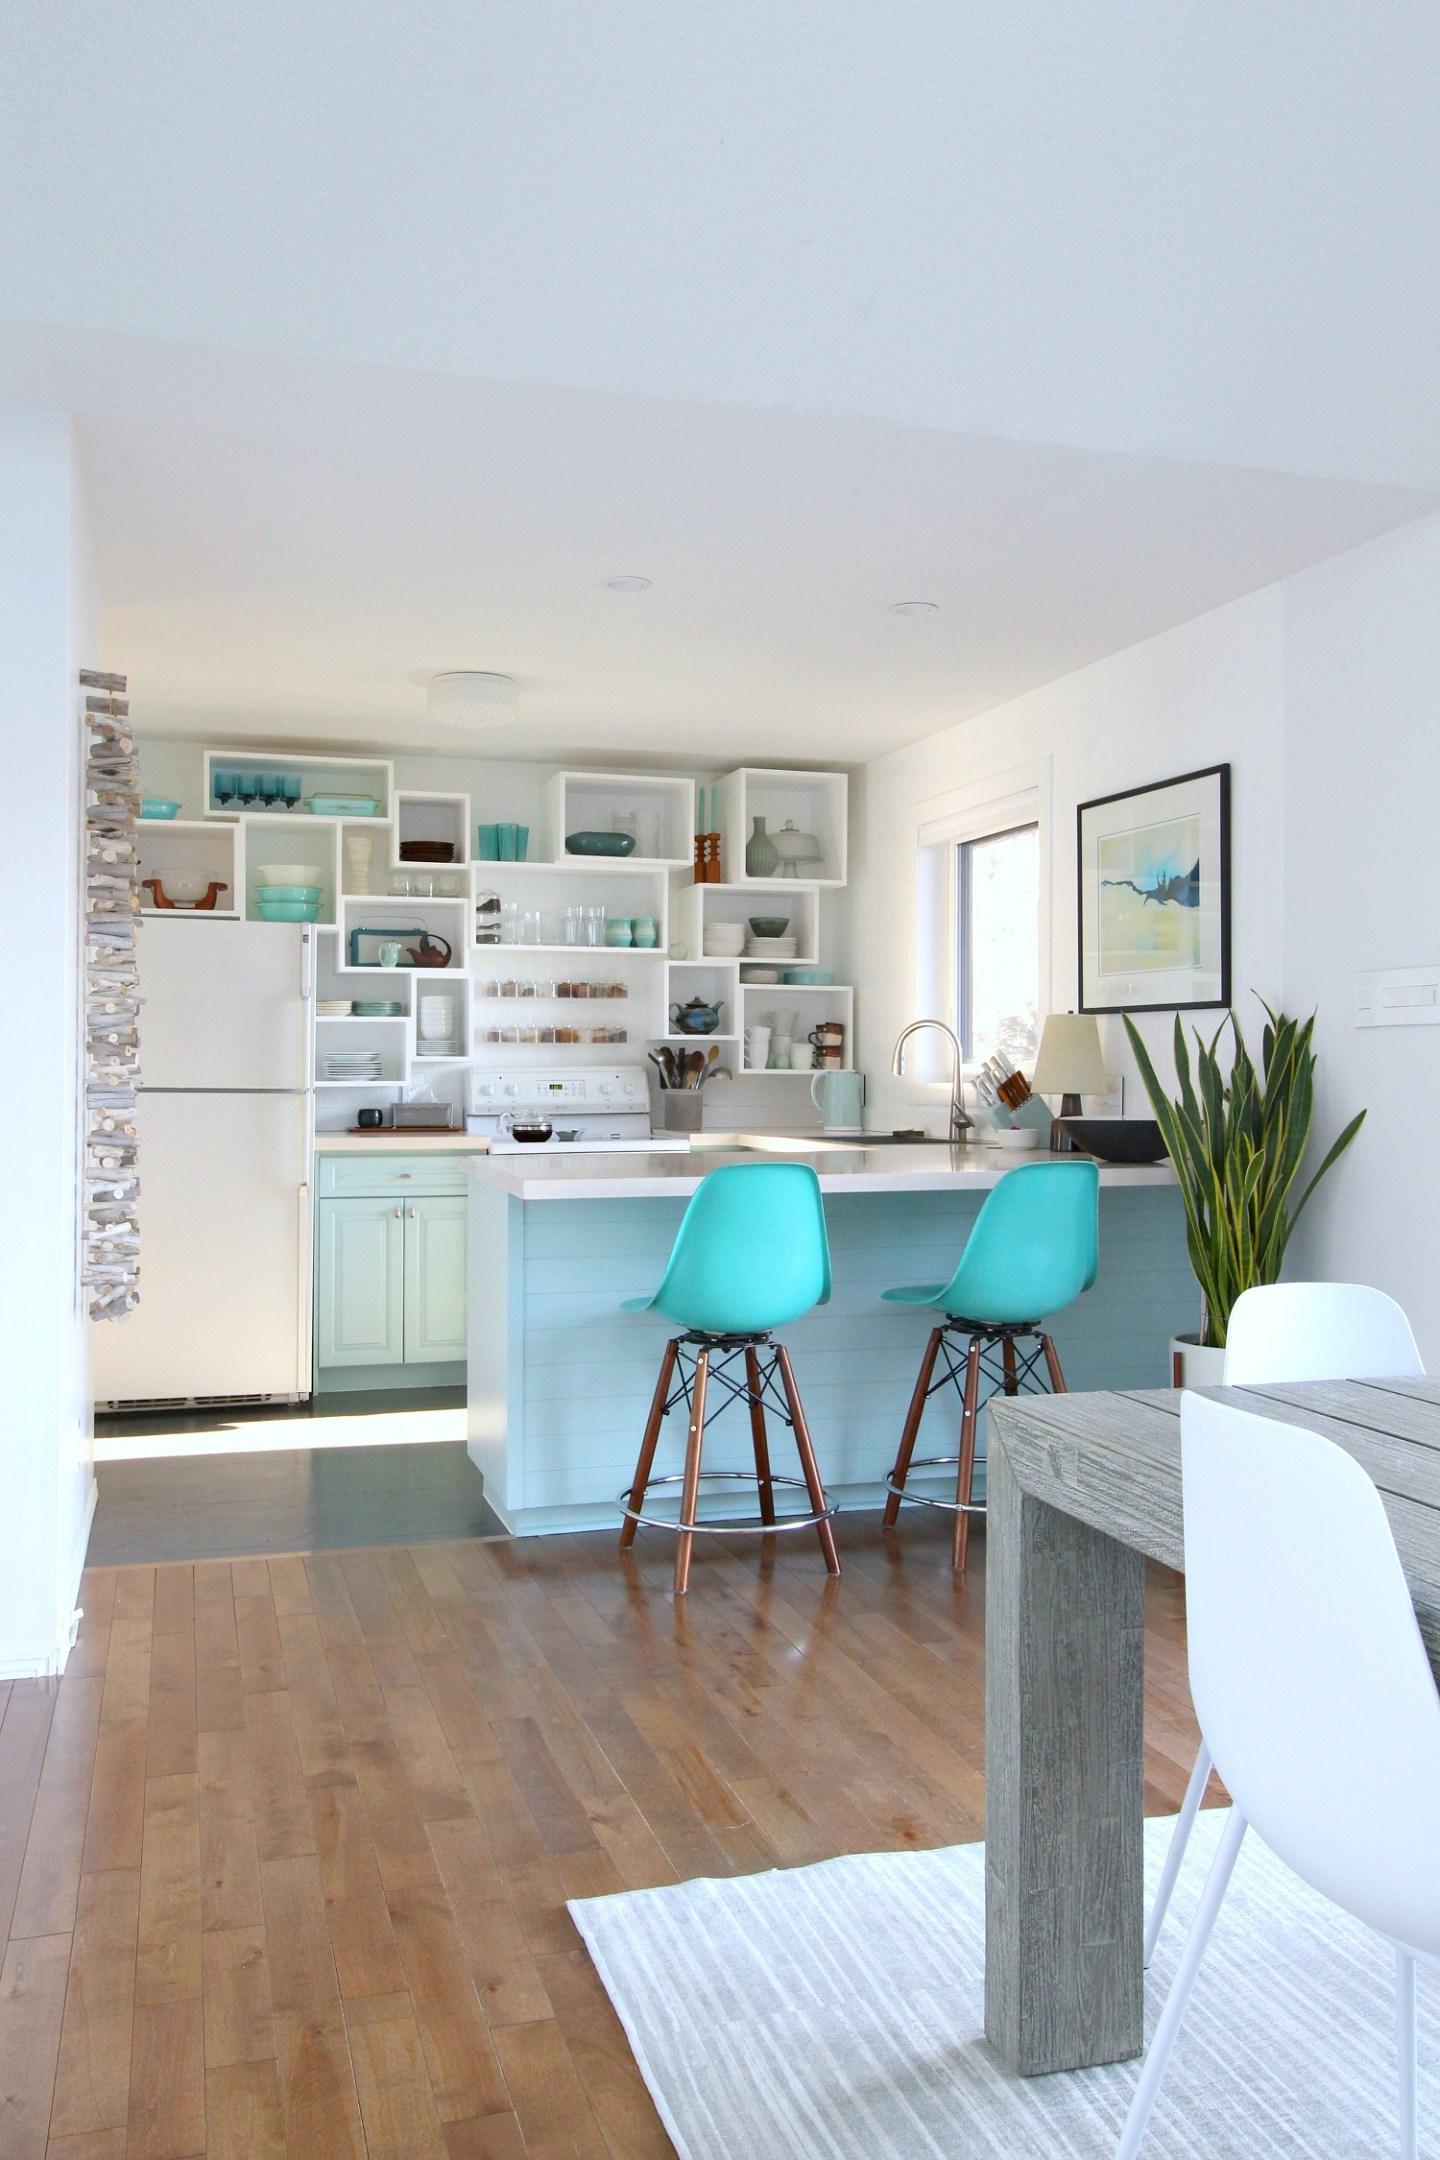 DIY Beachy Kitchen Makeover